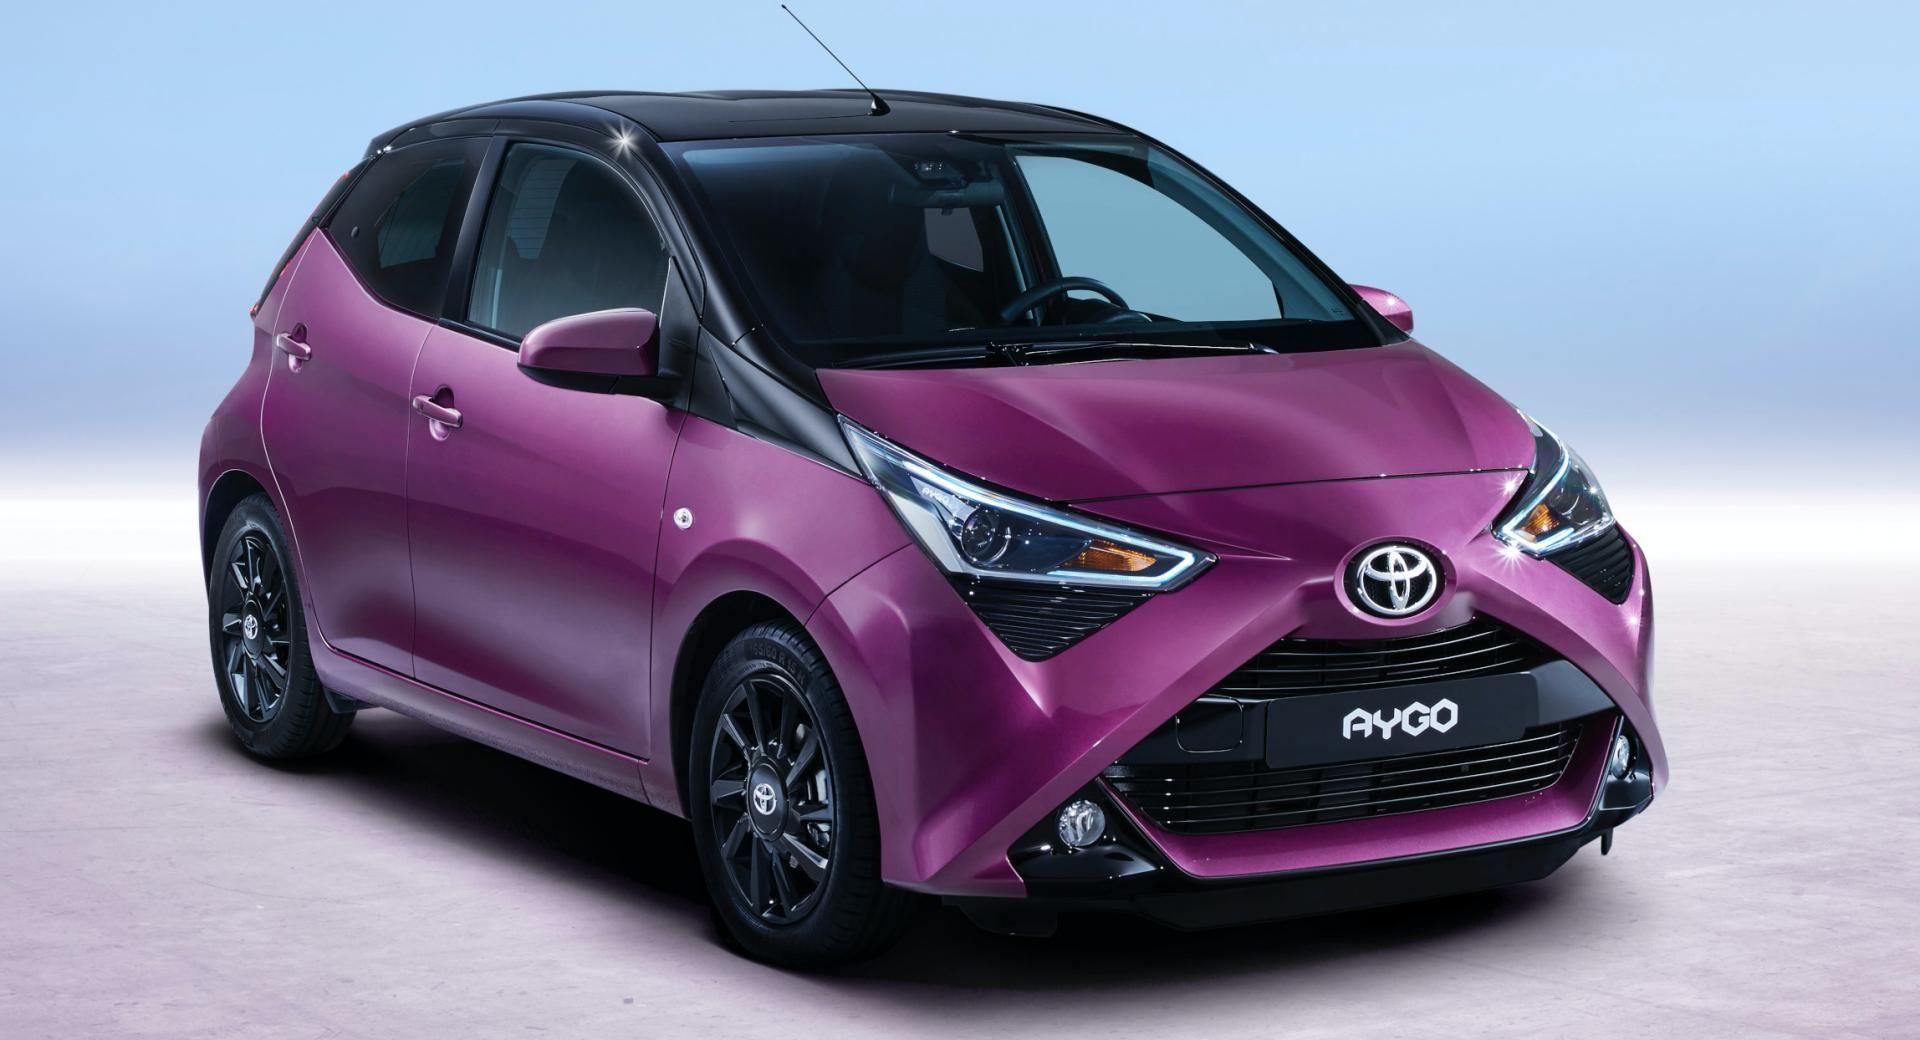 ThirdGeneration Toyota Aygo Confirmed, Will Likely Go